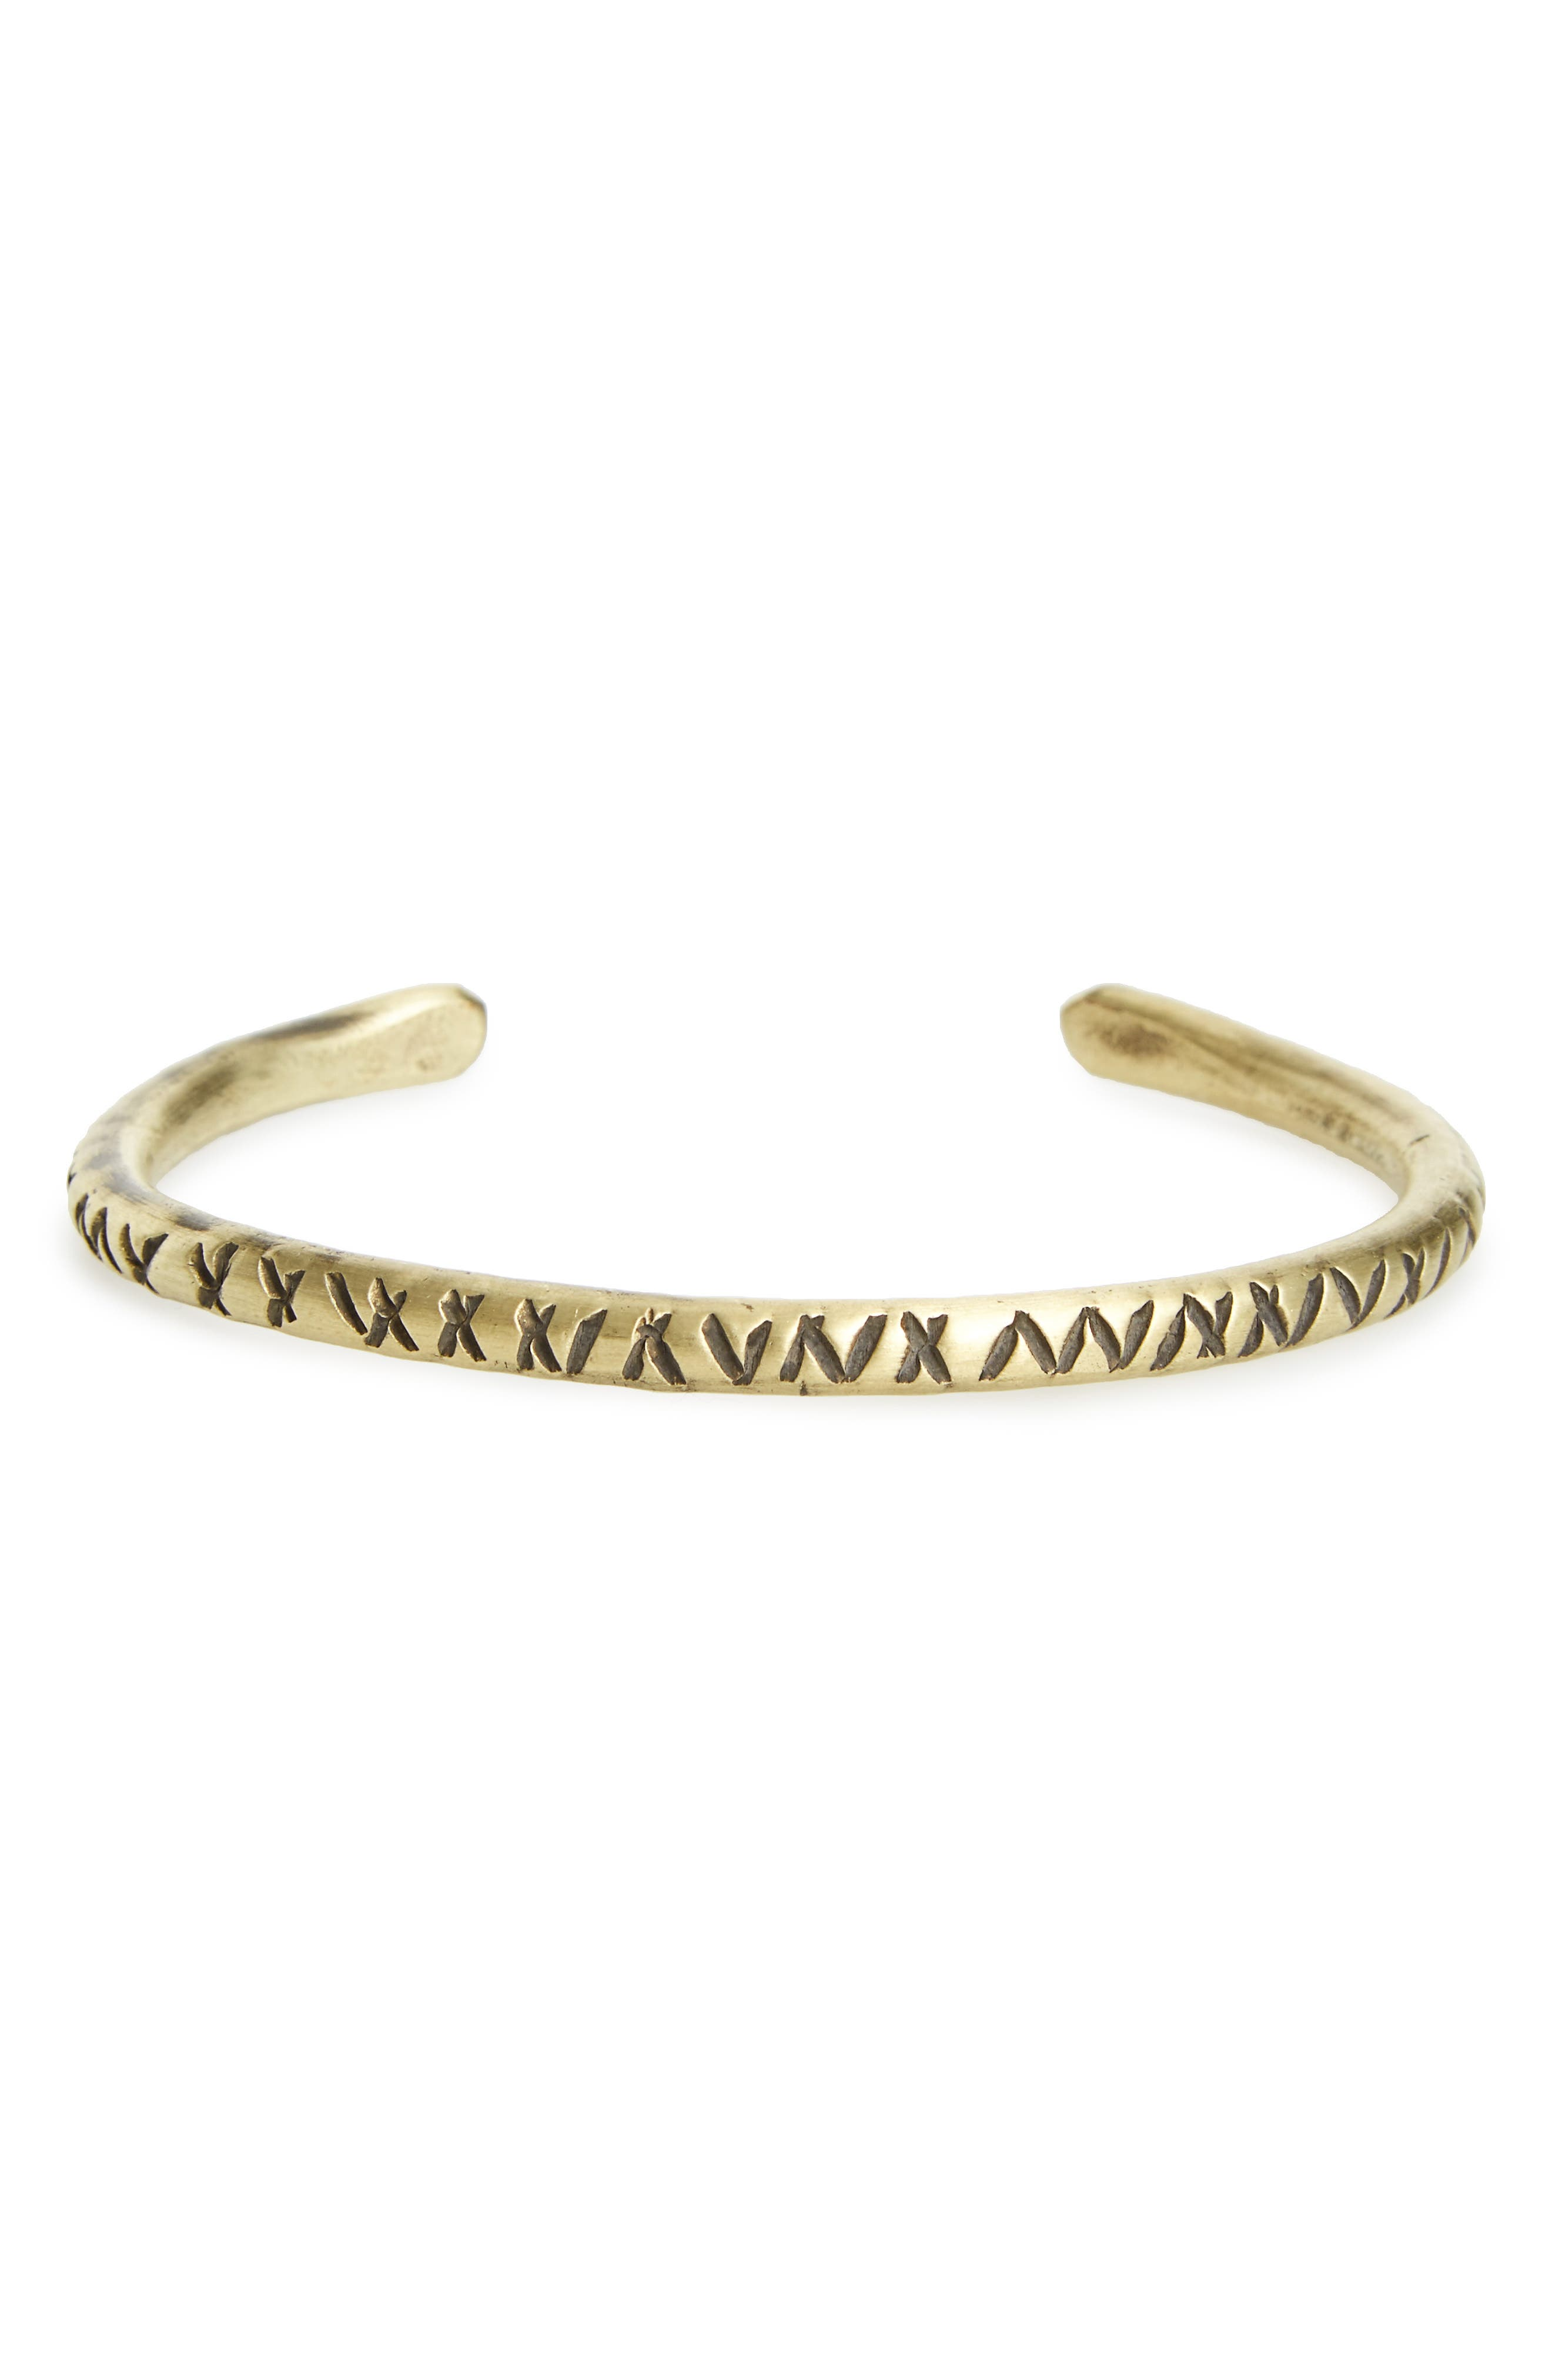 Main Image - Cause & Effect Brass Cuff Bracelet